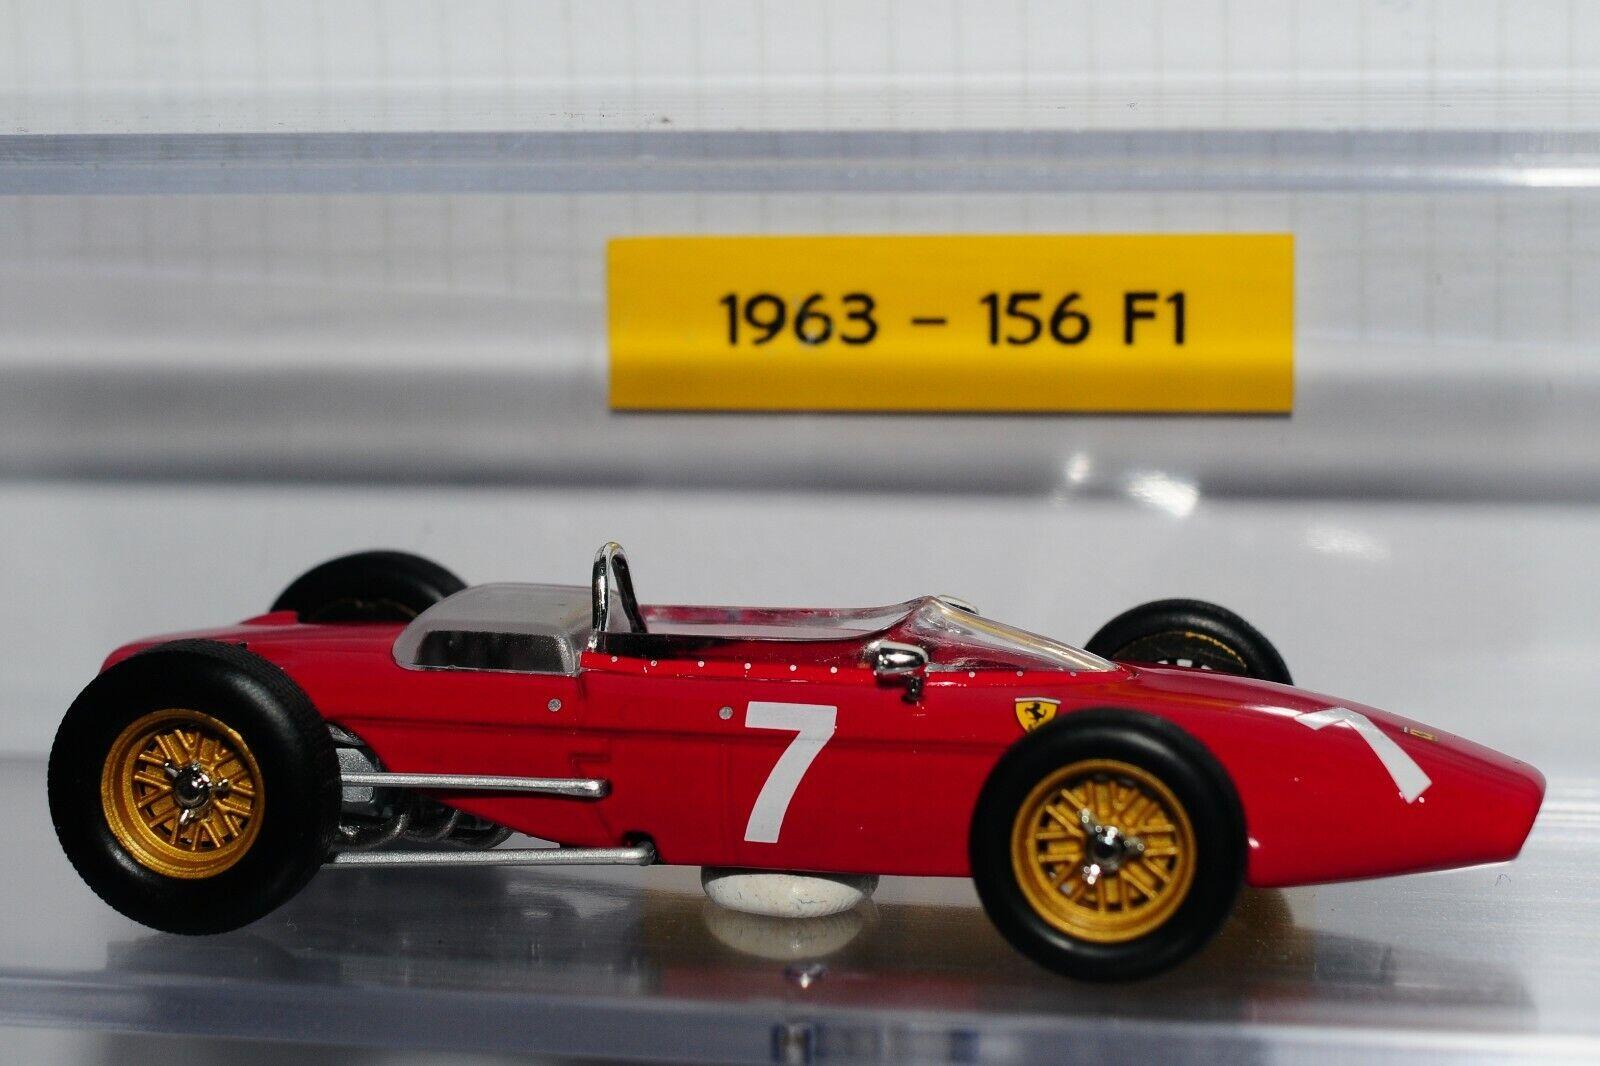 Model Ferrari 1 43 Ferrari 1963 156 num 7